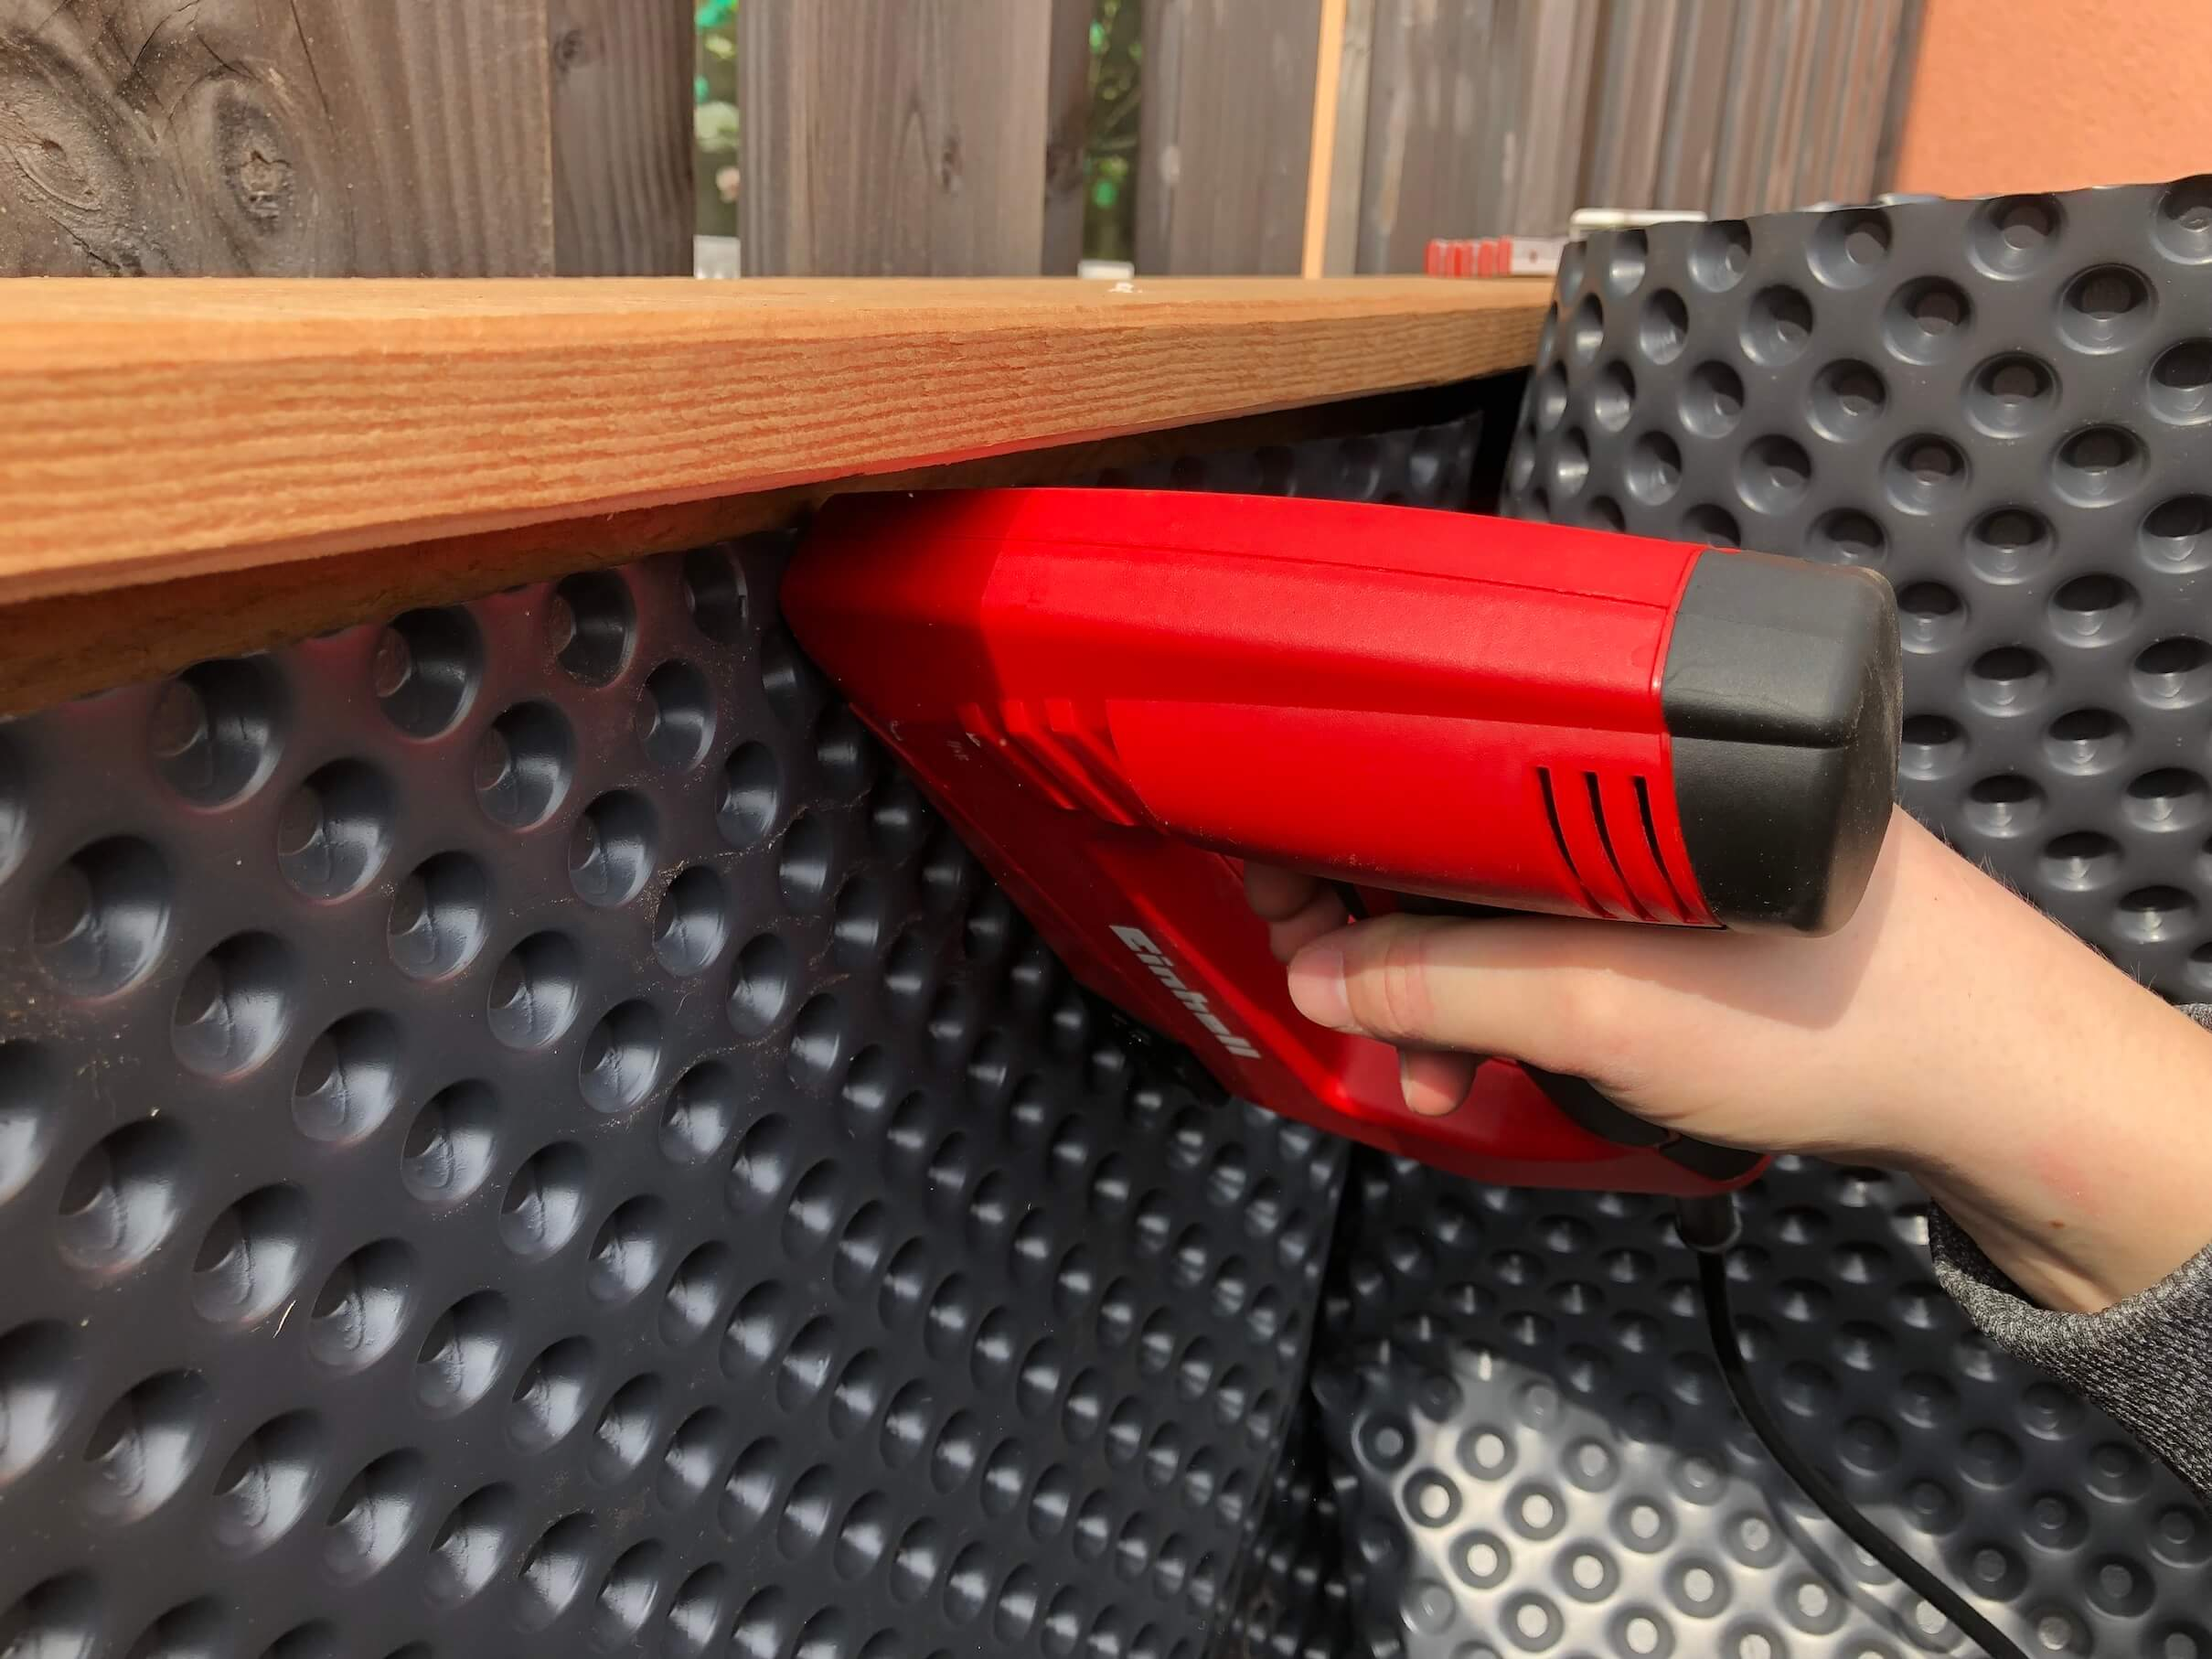 Heimwerker Praxis Test Laser Entfernungsmesser : Einhell elektrotacker tc en e im praxistest u heimwerker berater